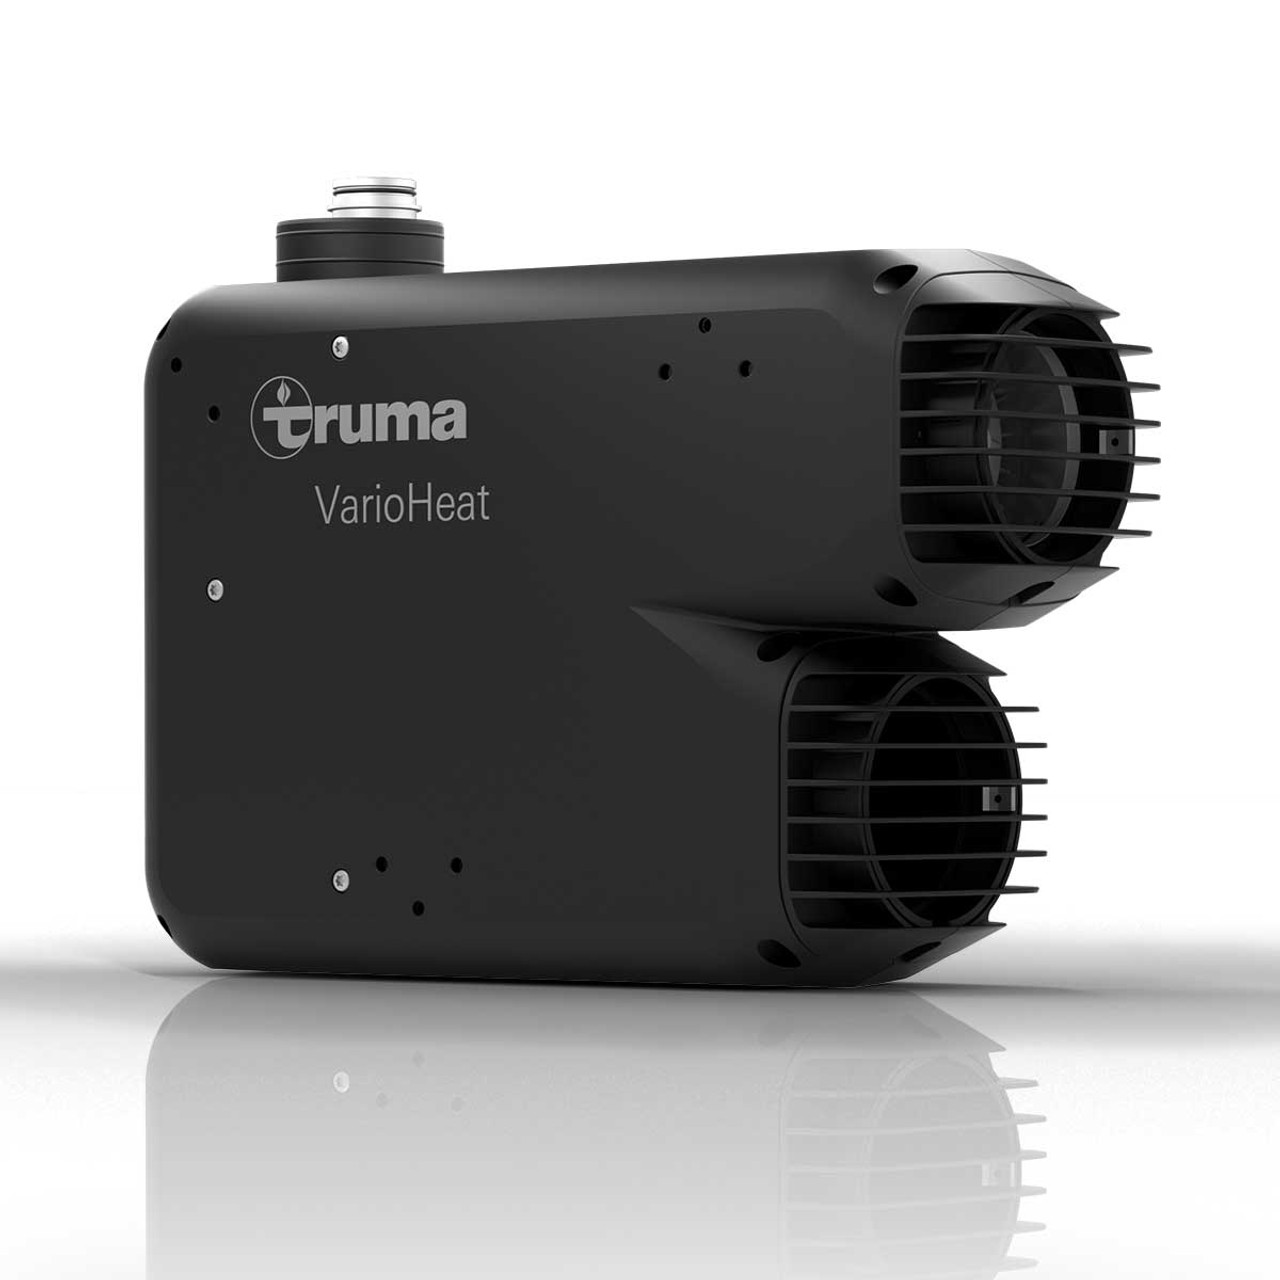 The Truma Varioheat space heater unit